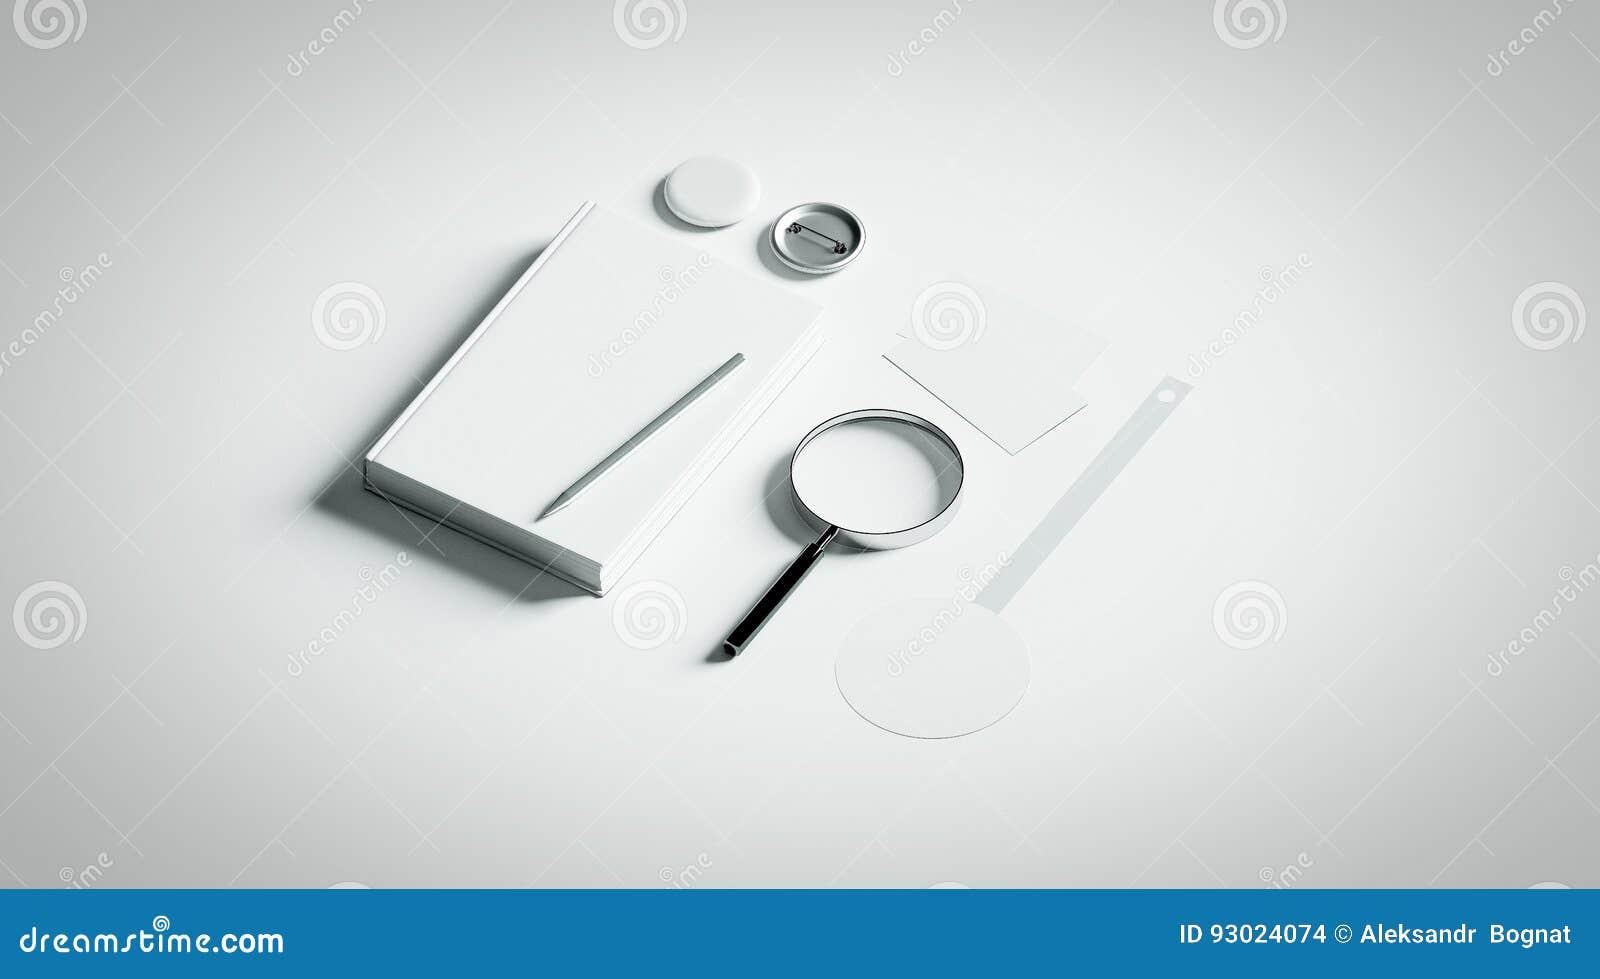 Book Presentation Design Mockup Elements, Stock Photo